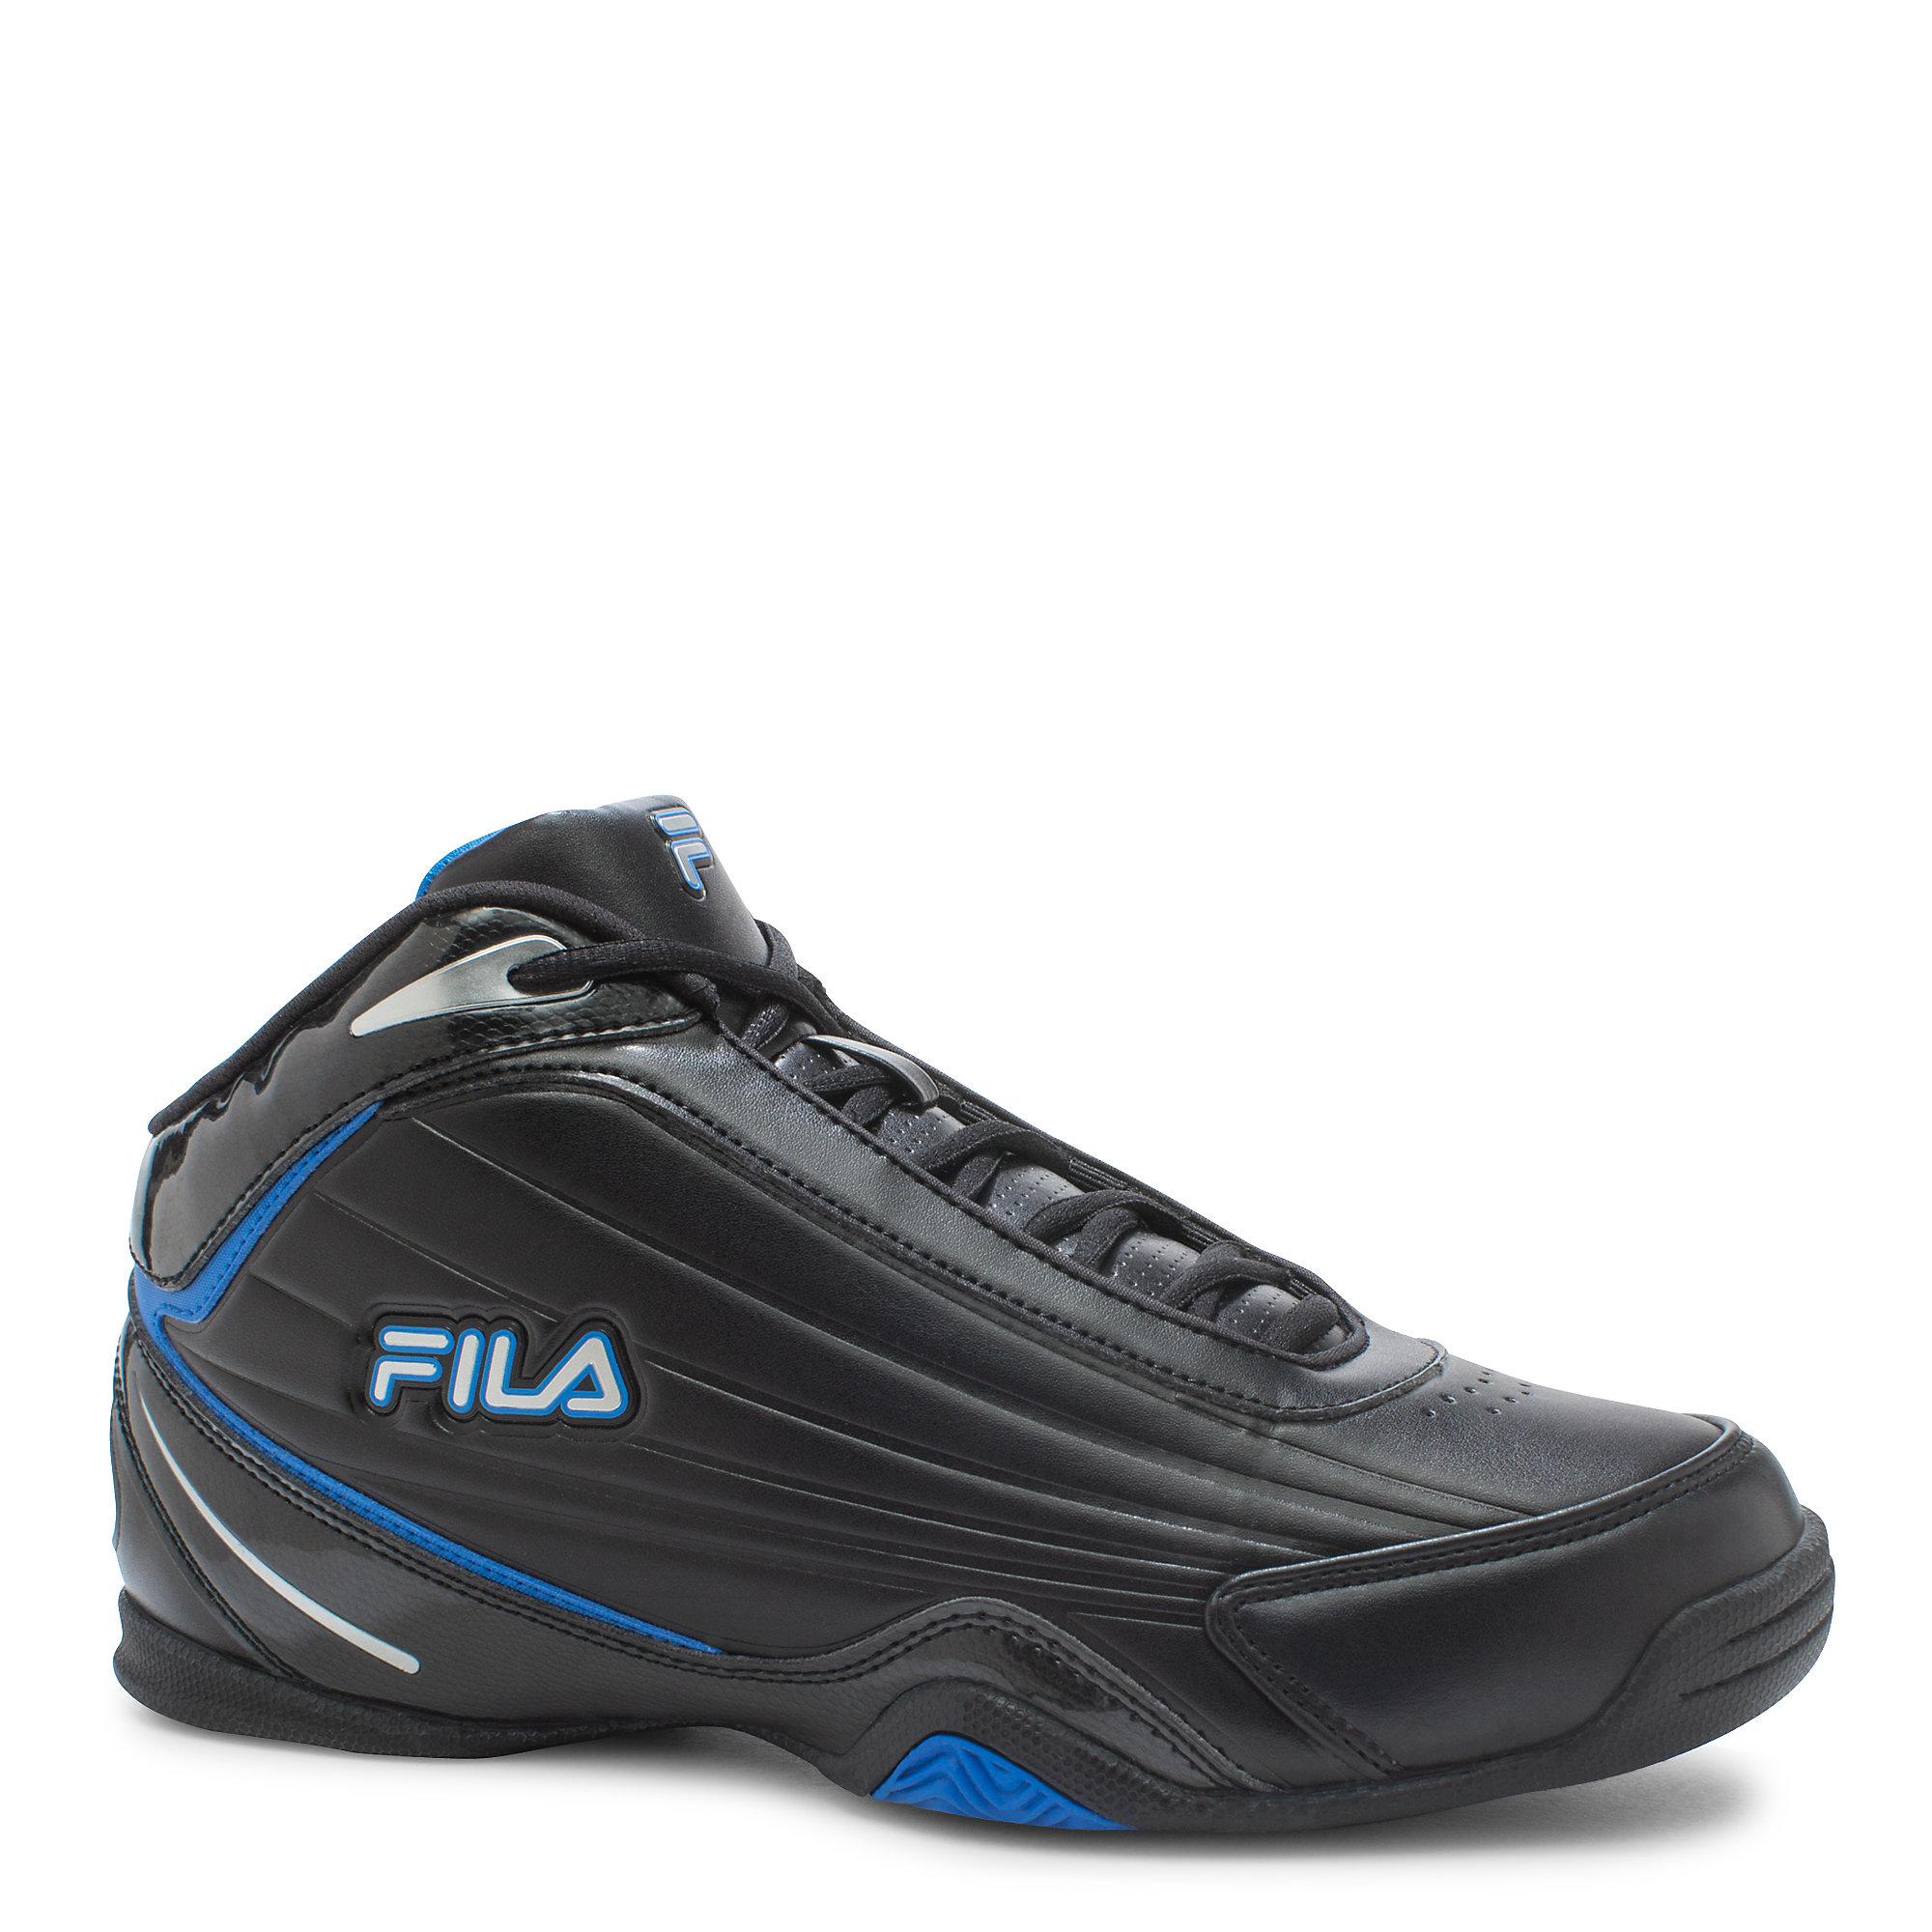 fila men 39 s slam 12c basketball sneakers ebay. Black Bedroom Furniture Sets. Home Design Ideas